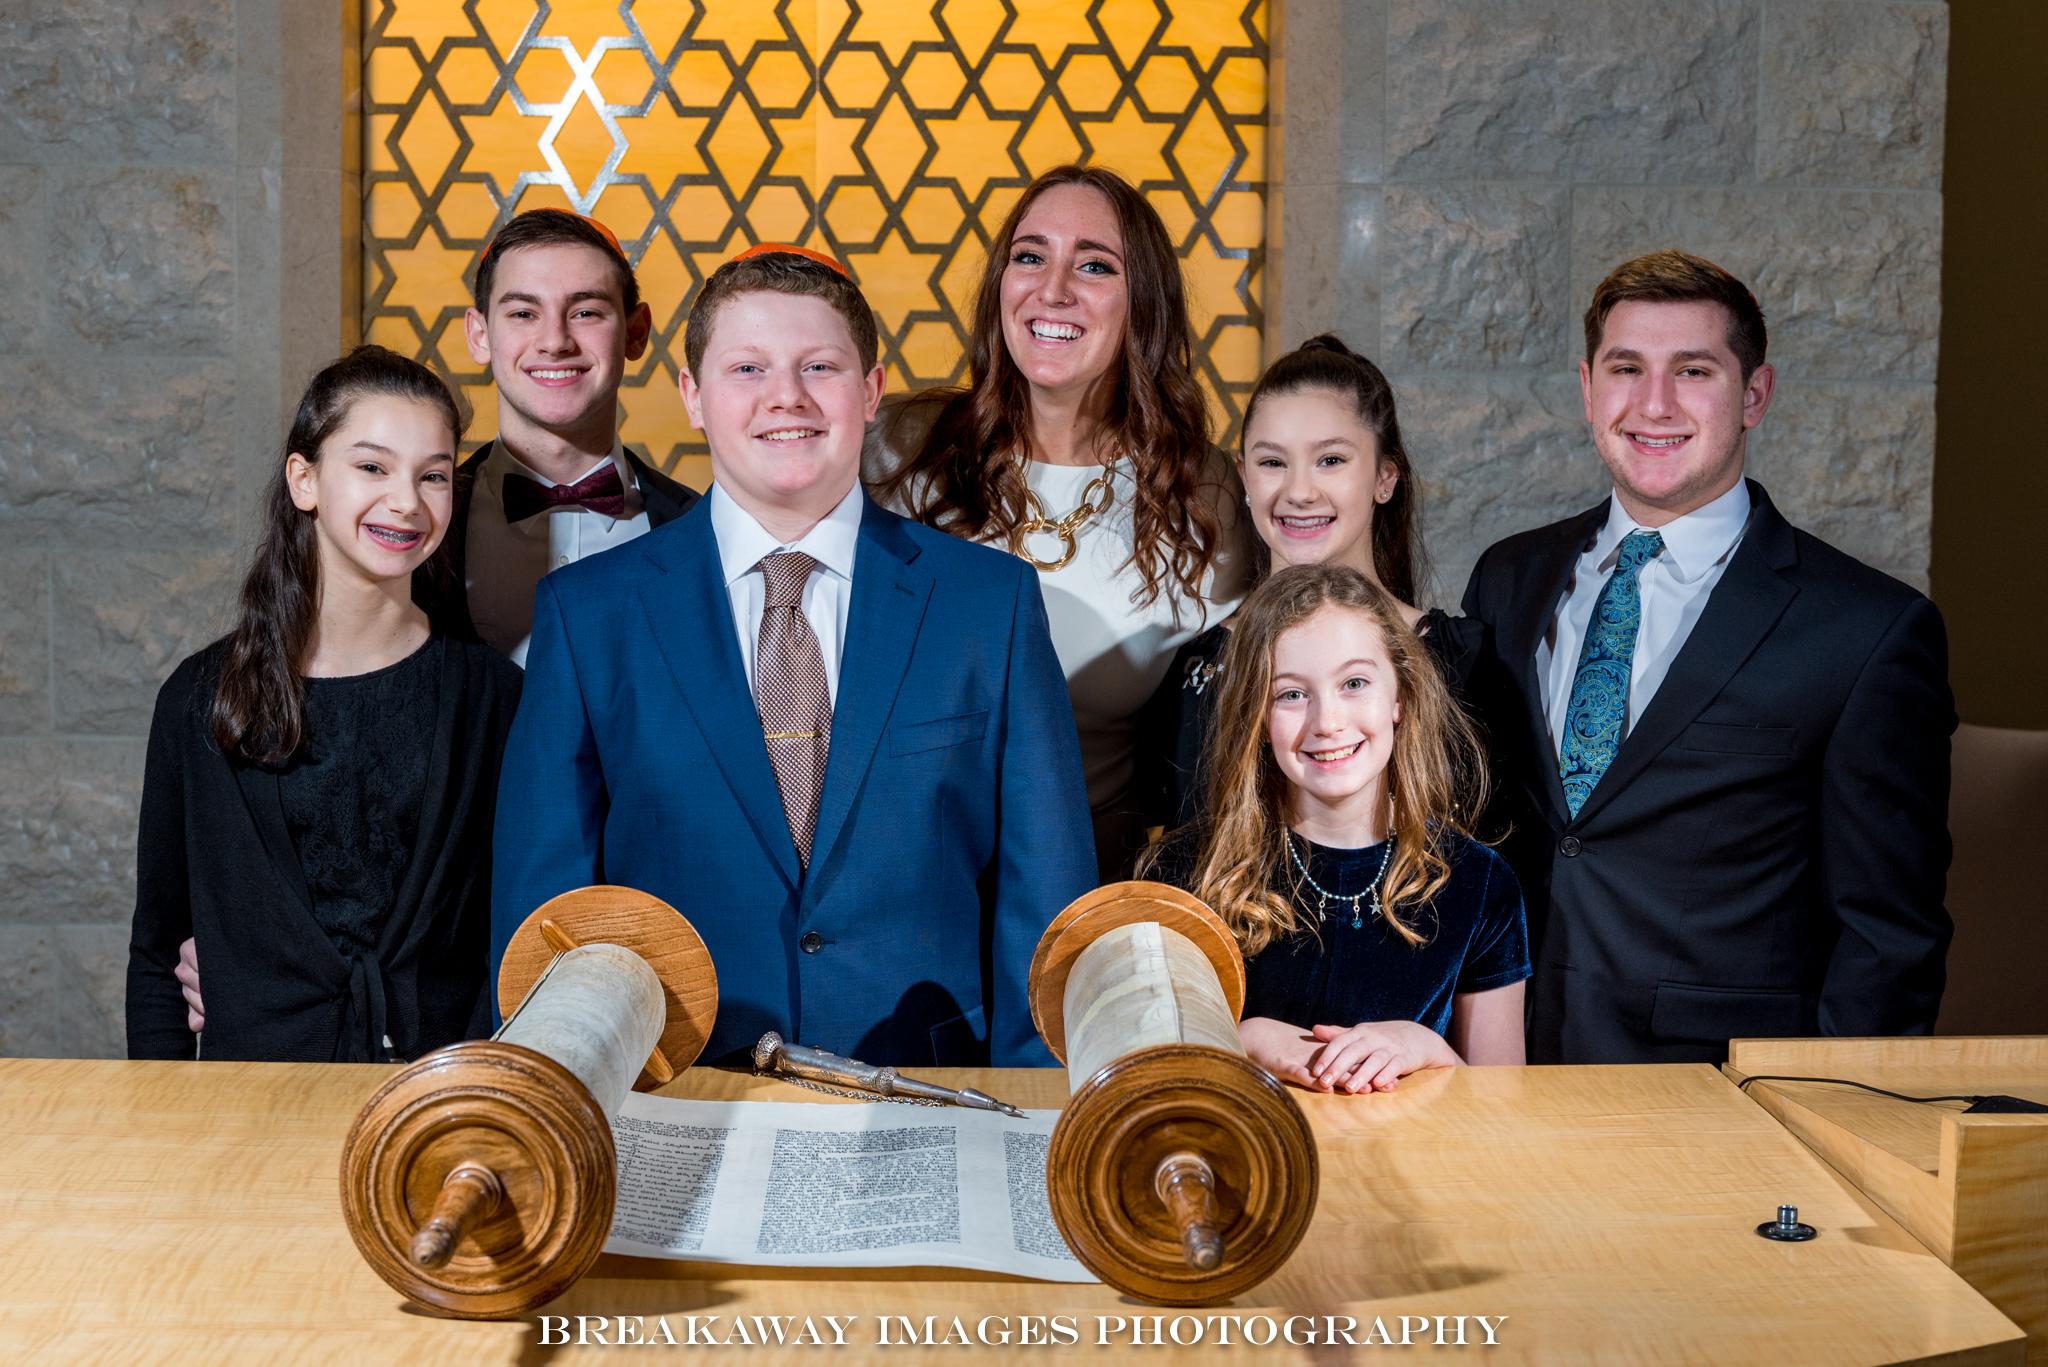 Matthew Levithan Bar Mitzvah 2019-01-19 v-79.jpg